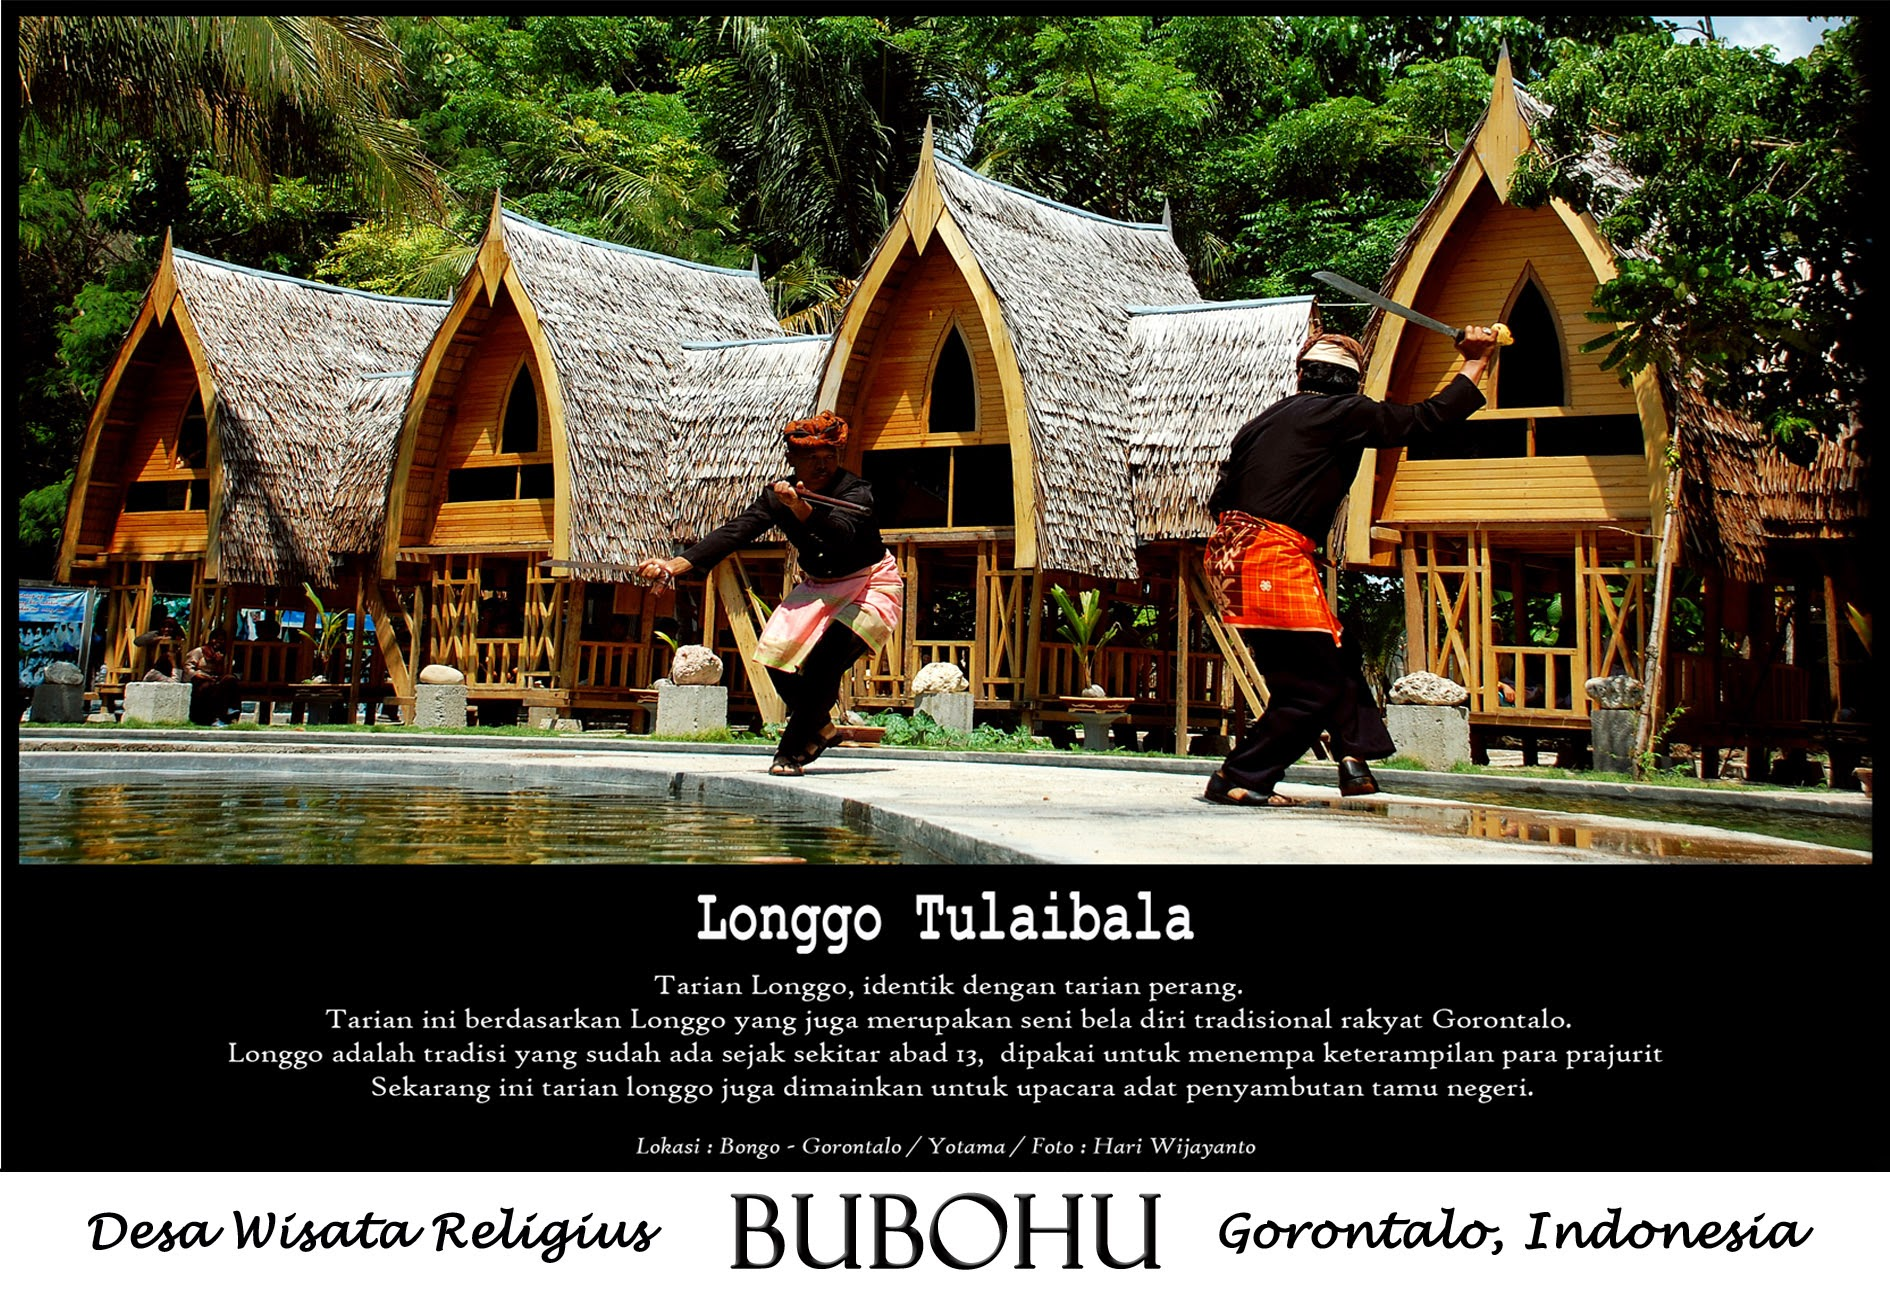 Album Google Wisata Religi Bubohu Desa Bongo Photo Loading Dinas